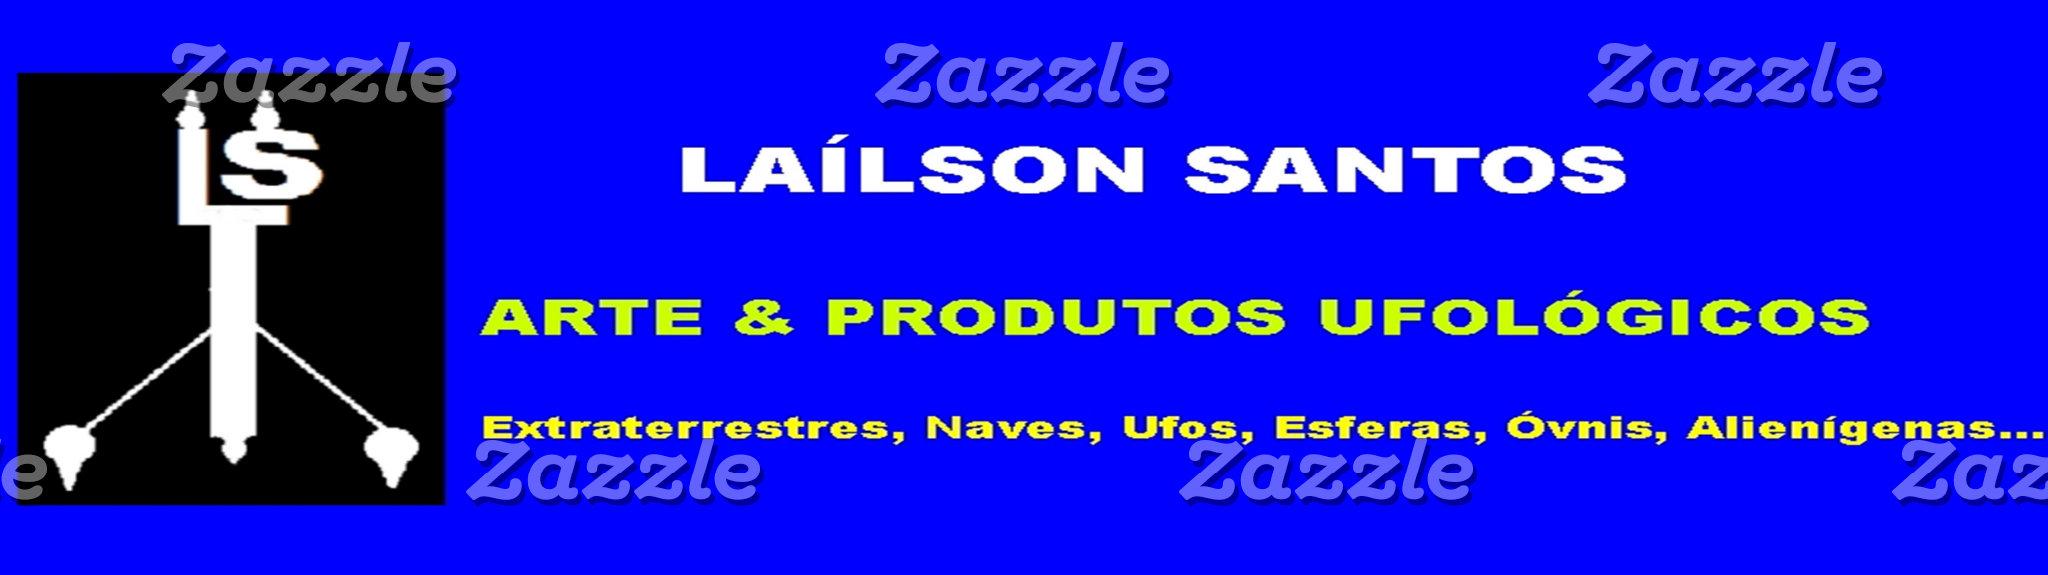 LailsonSantos